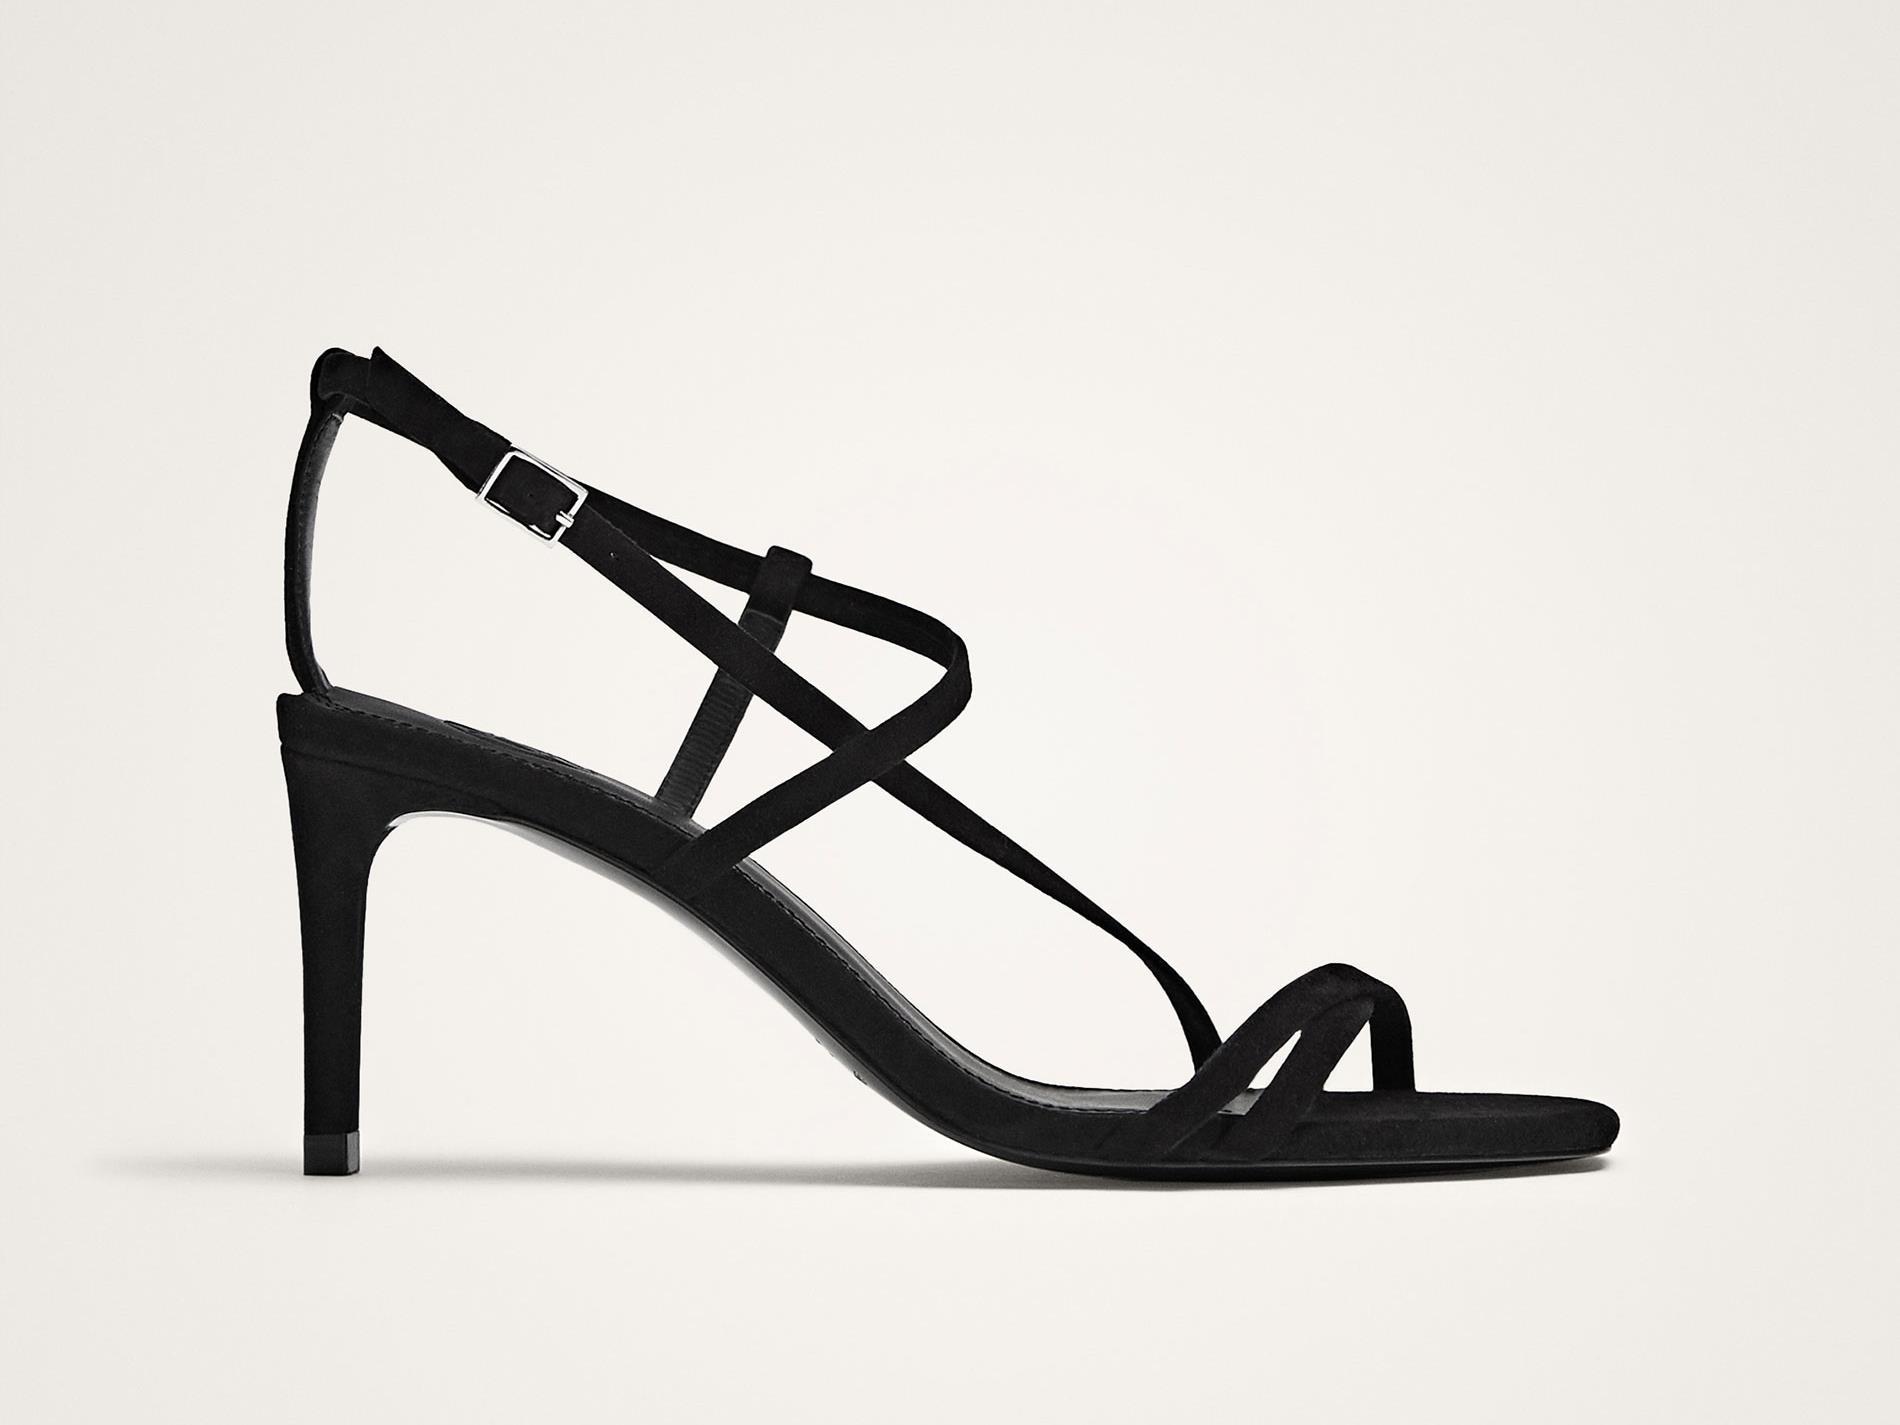 85f9f94419c sandalias-negras-massimo-dutti. Sandalias negras con tacón bajo